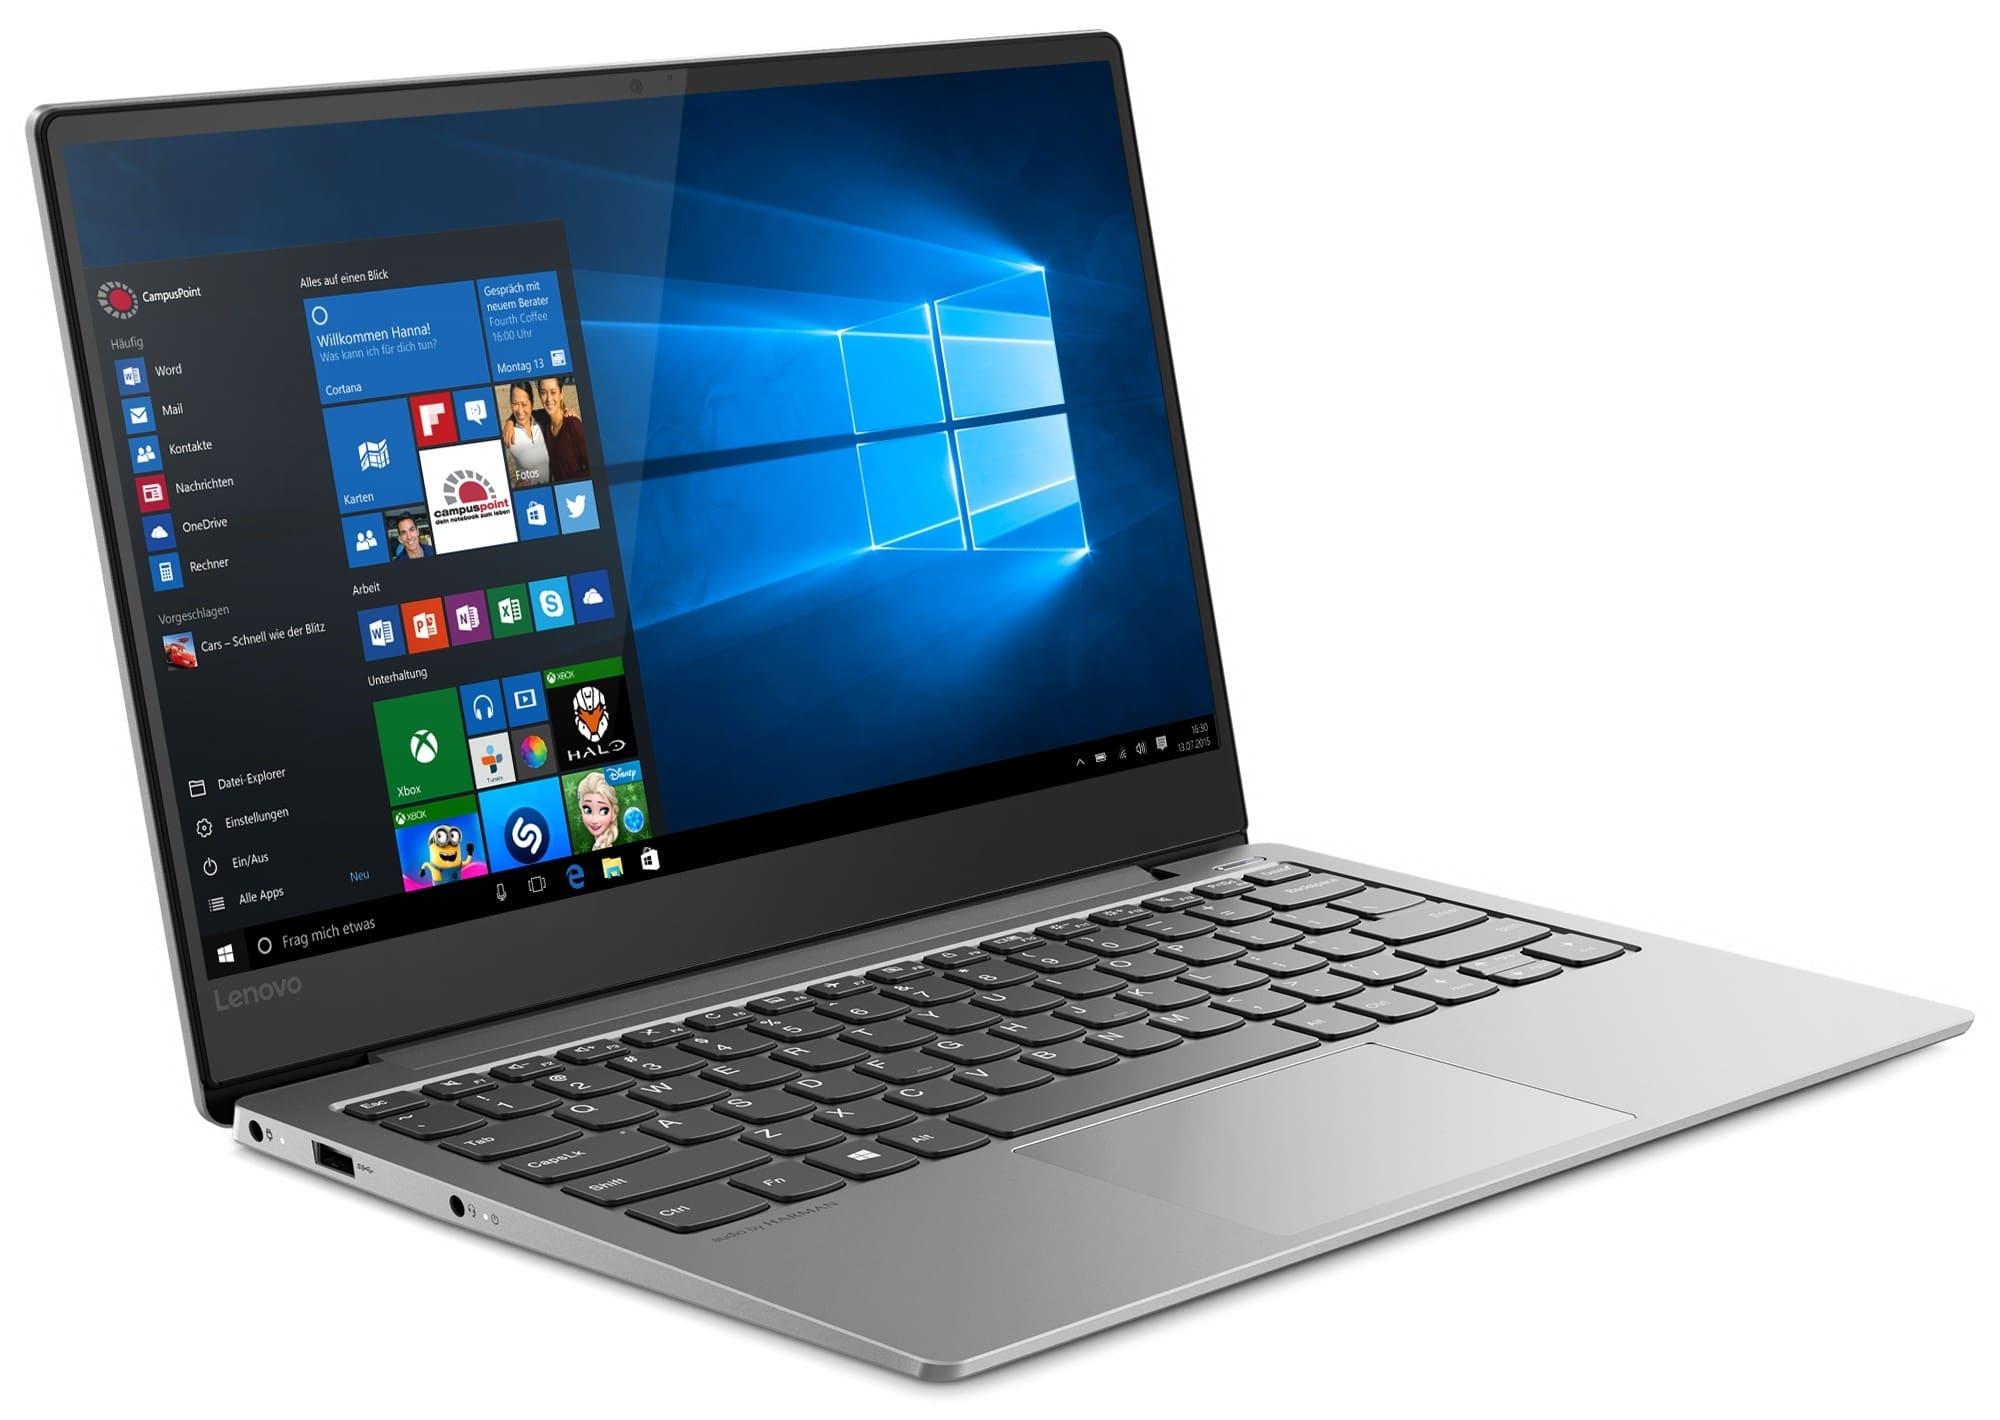 Lenovo IdeaPad S530-13IWL, 13 pouces léger performant (649€)